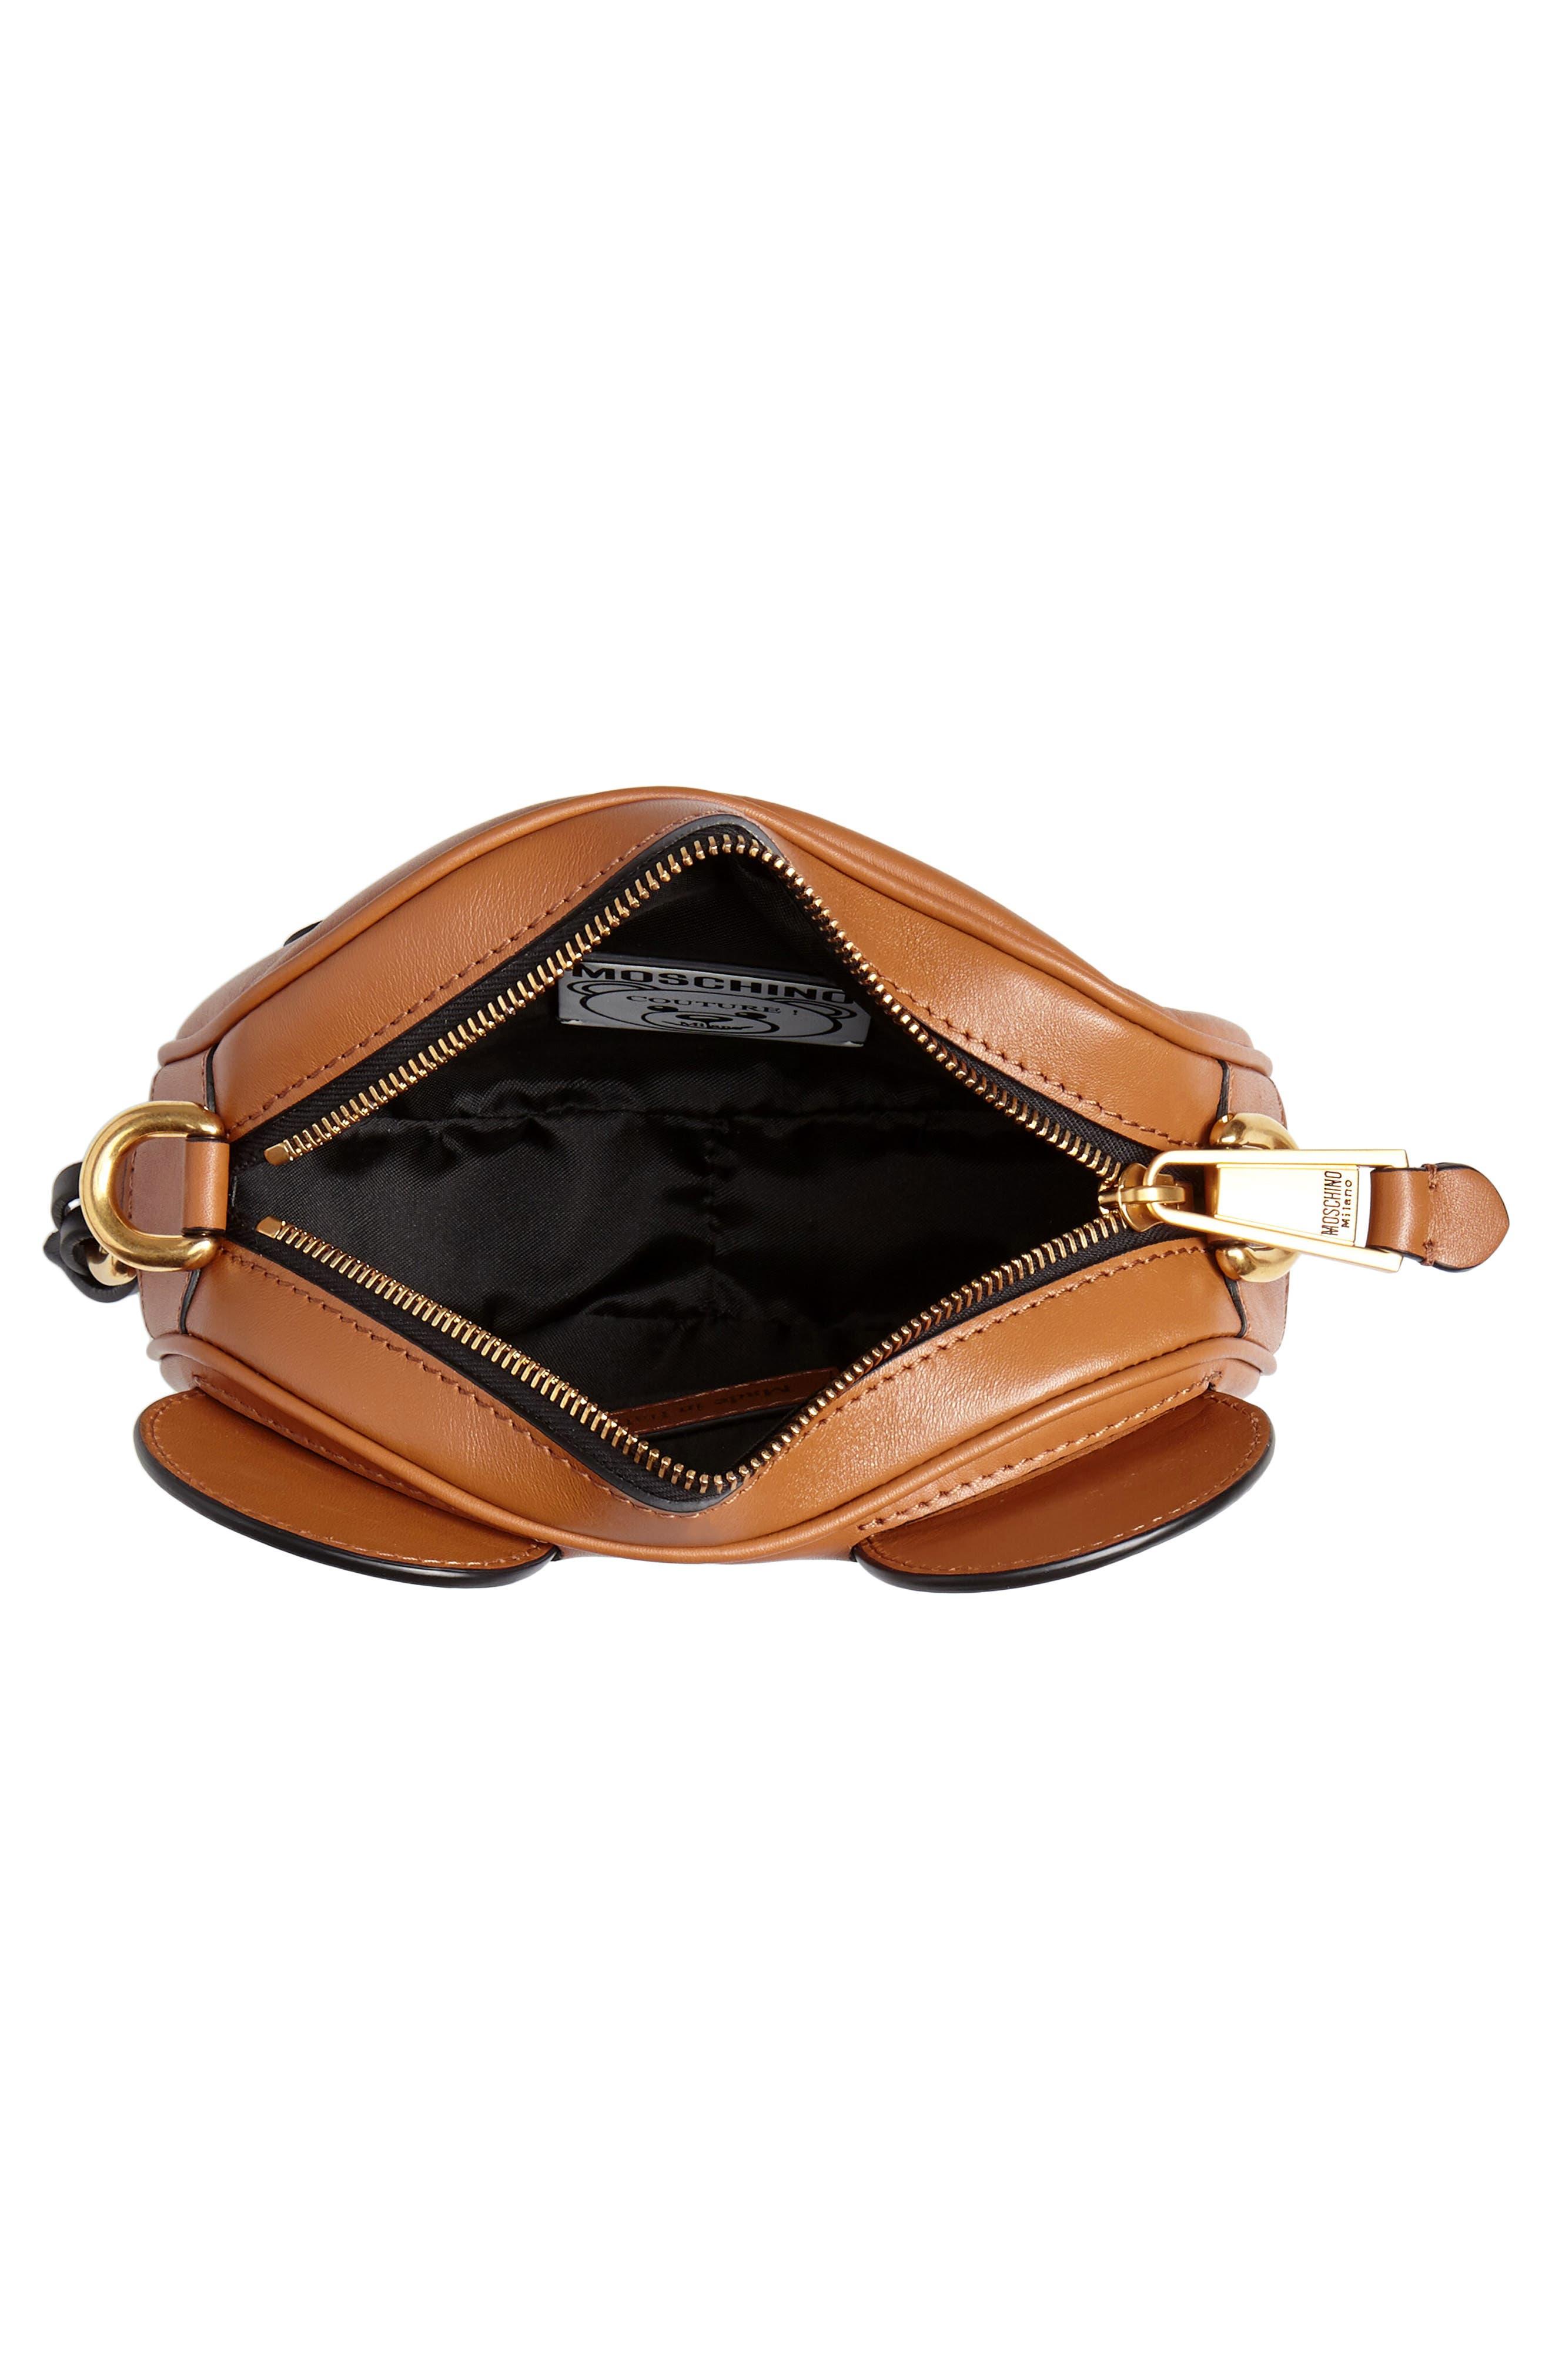 Crystal Teddy Leather Crossbody Bag,                             Alternate thumbnail 4, color,                             BROWN